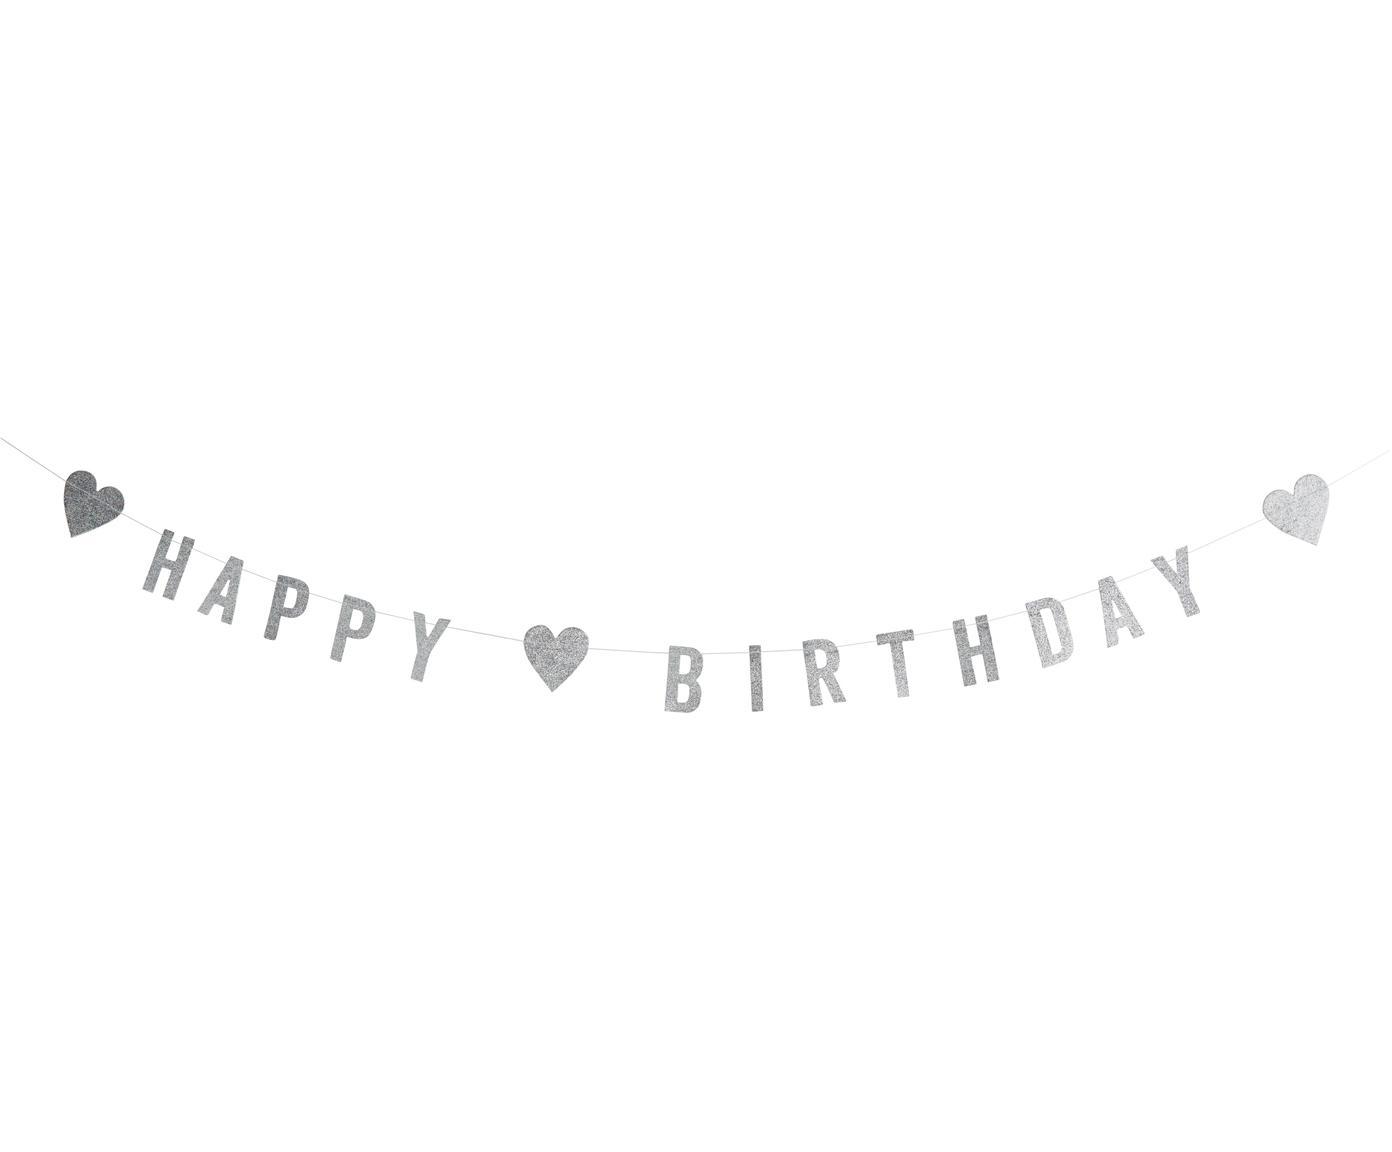 Ghirlanda in carta Happy Birthday, Carta, cotone, Acciaio inossidabile, Lung. 100 cm